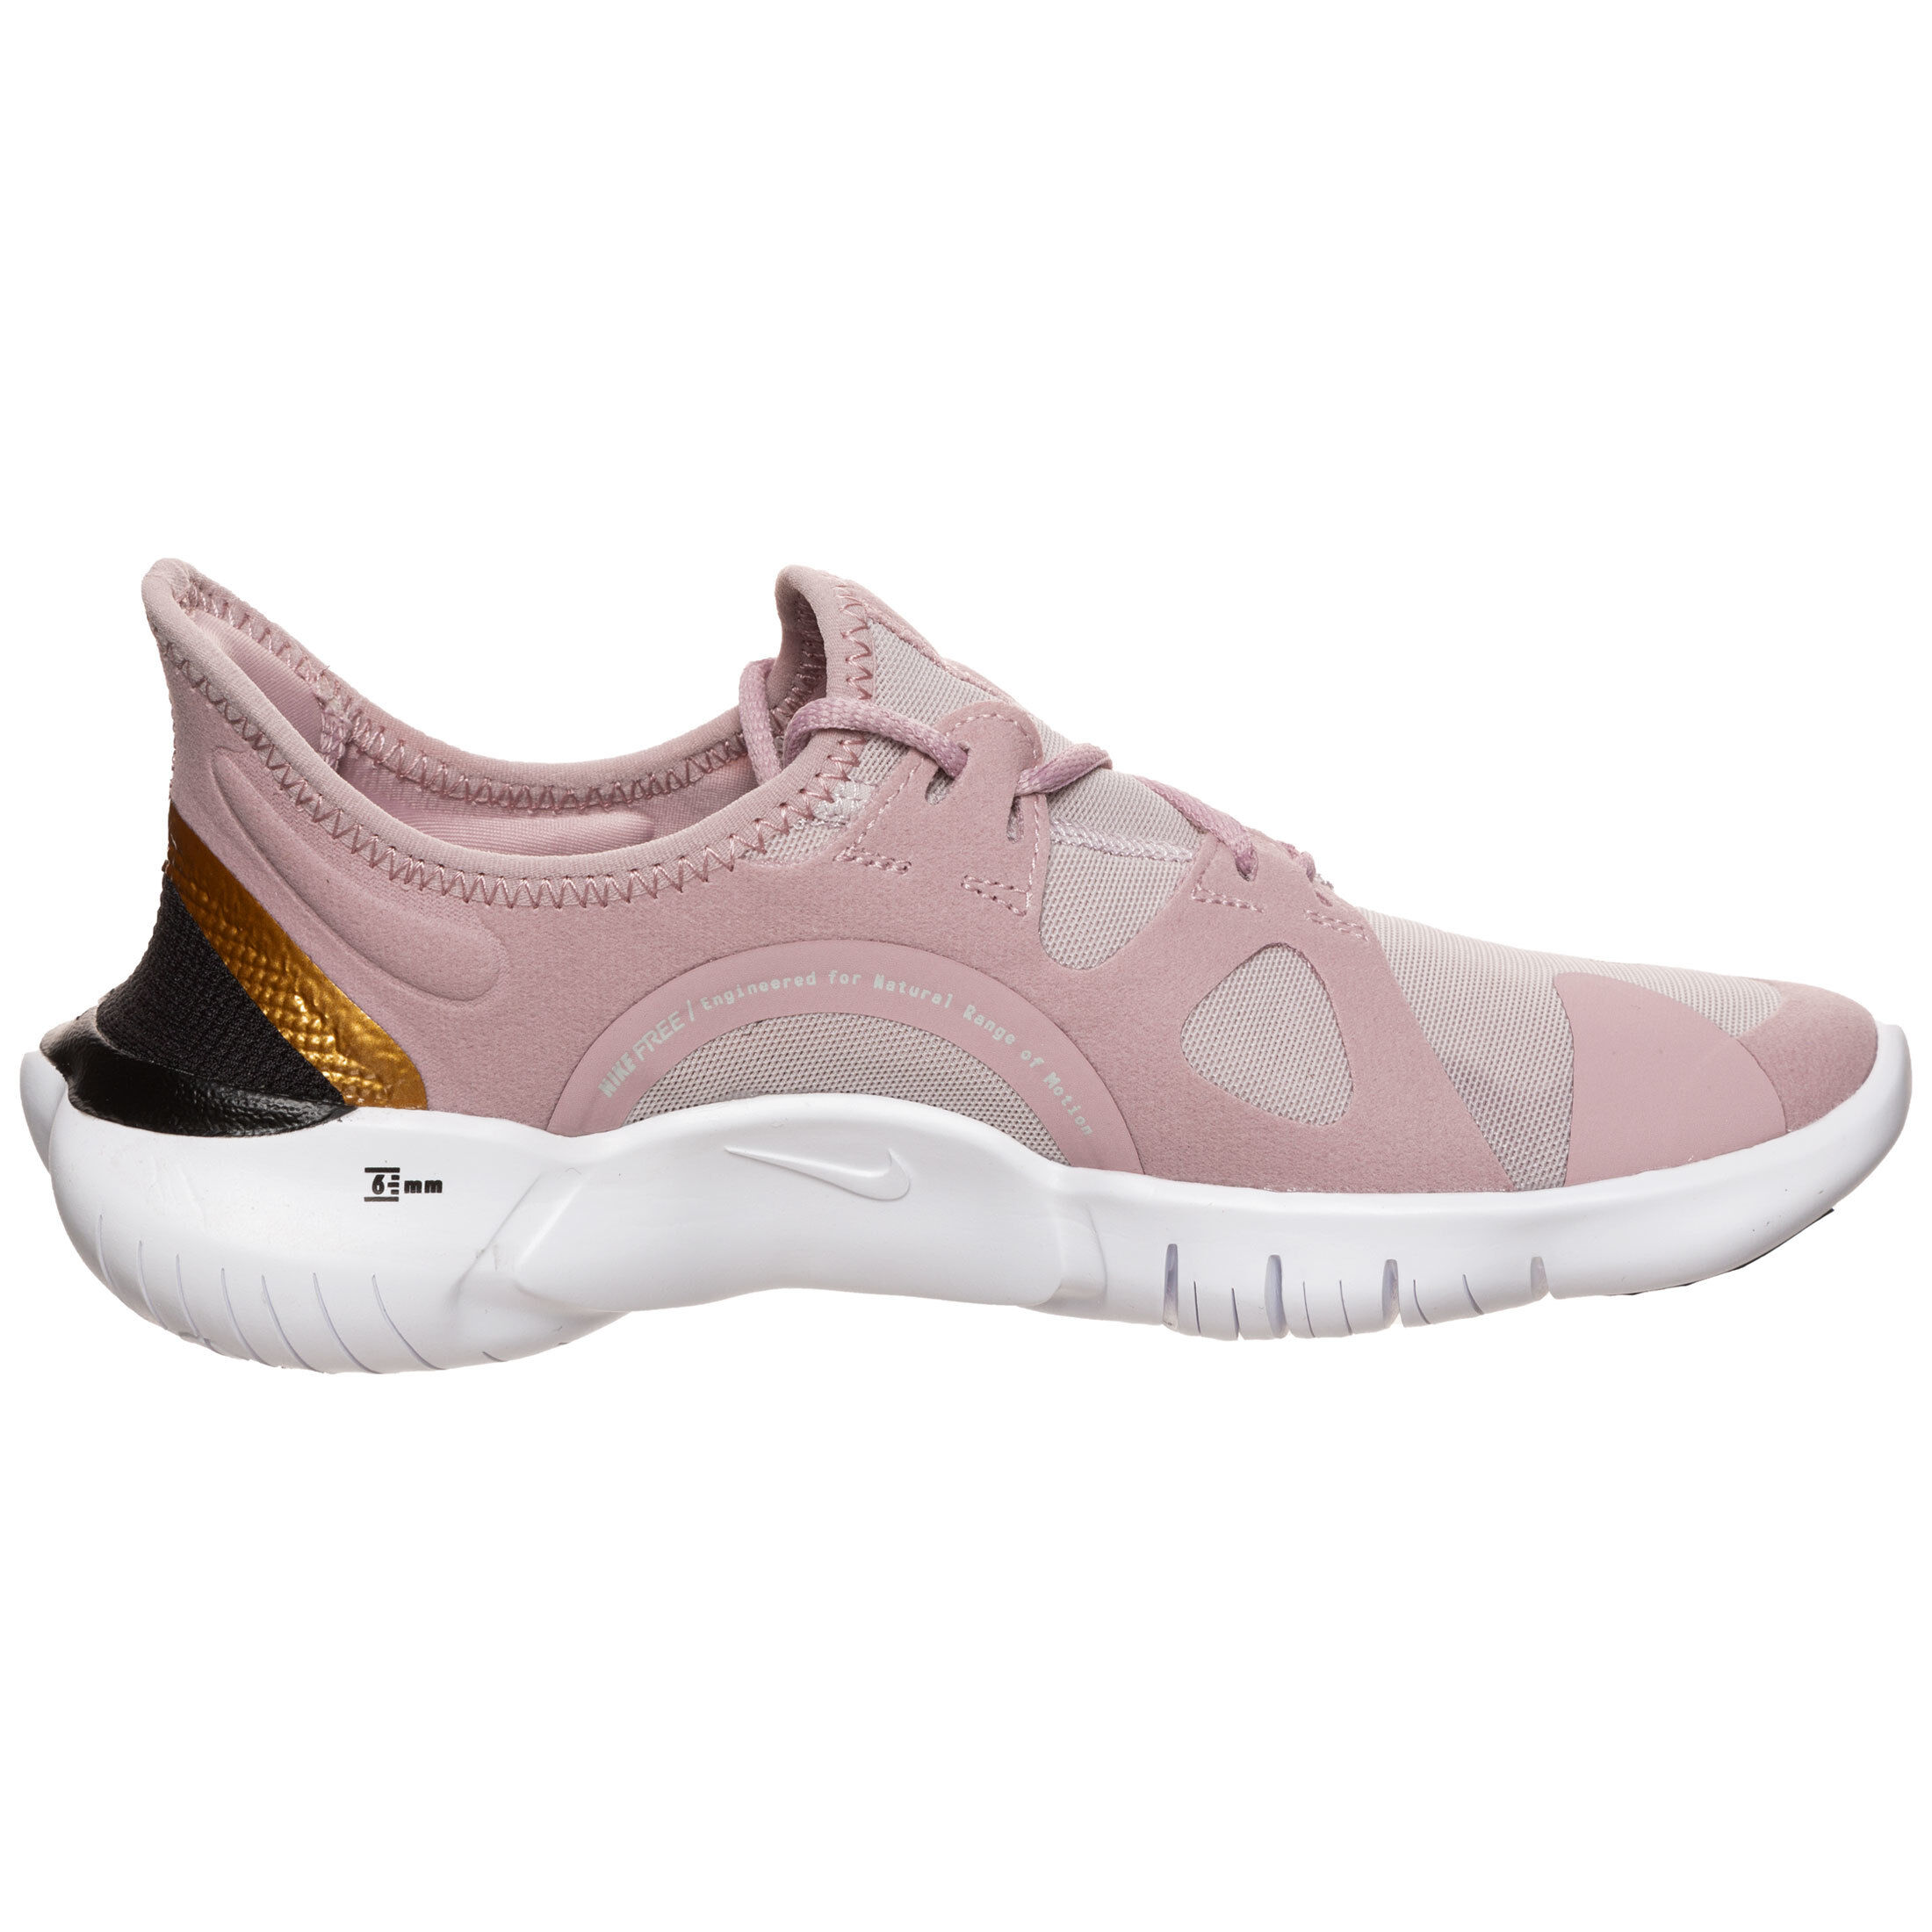 RosaLila Puma Laufschuhe Damen Schuhe Online Kaufen